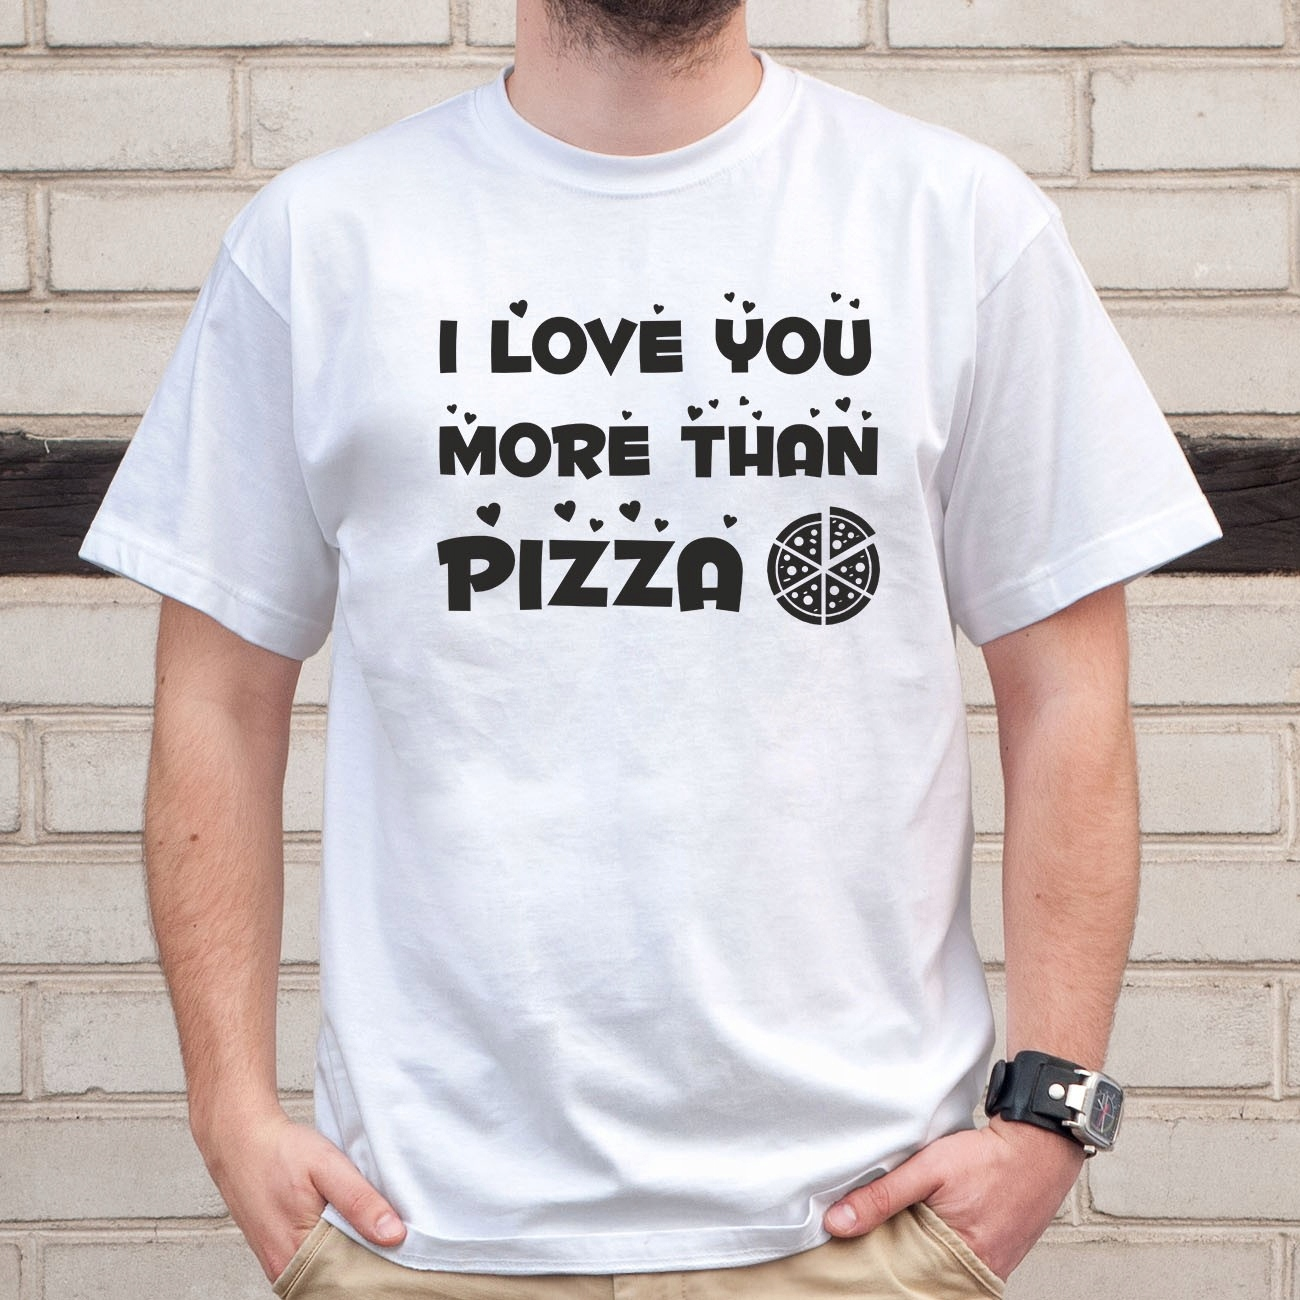 I love you more than pizza - koszulka dla niego